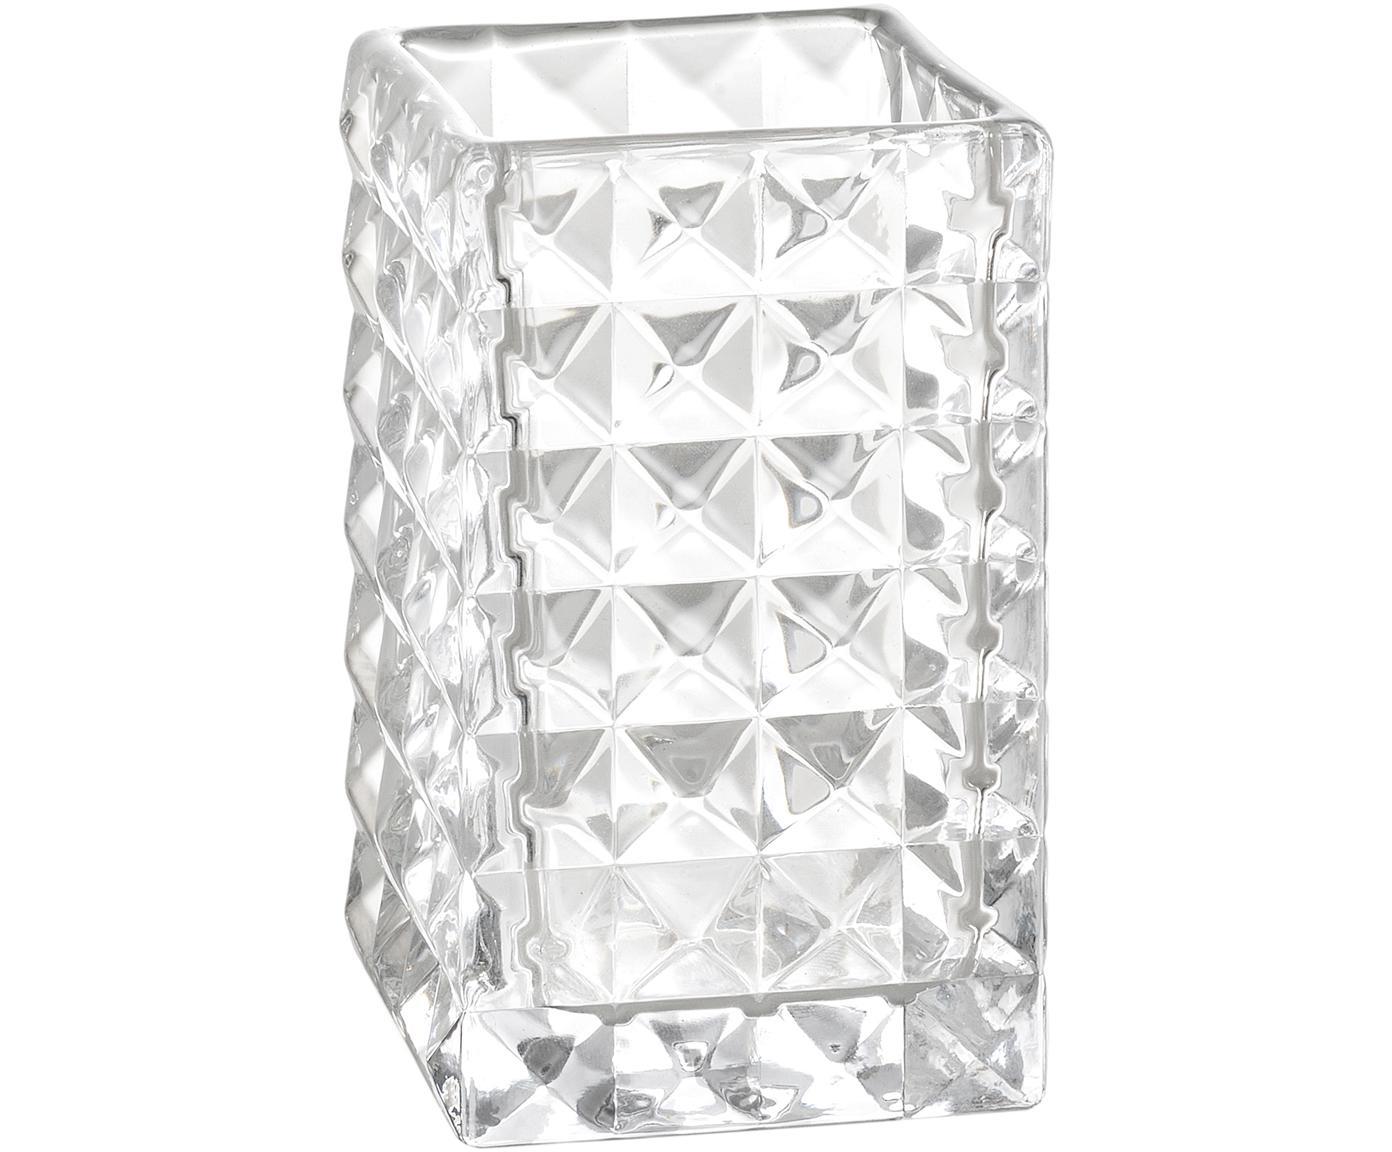 Porta spazzolini Dots, Vetro, Trasparente, Larg. 7 x Alt. 11 cm